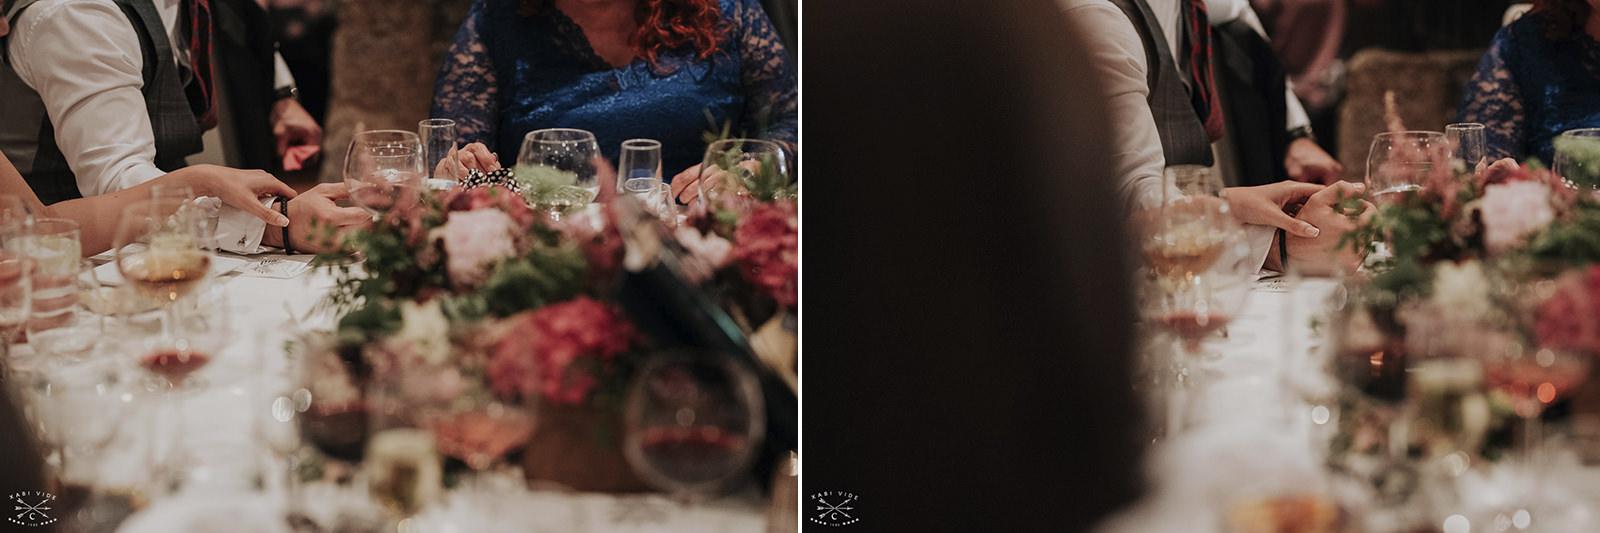 boda en la finca bauskain bodas-275